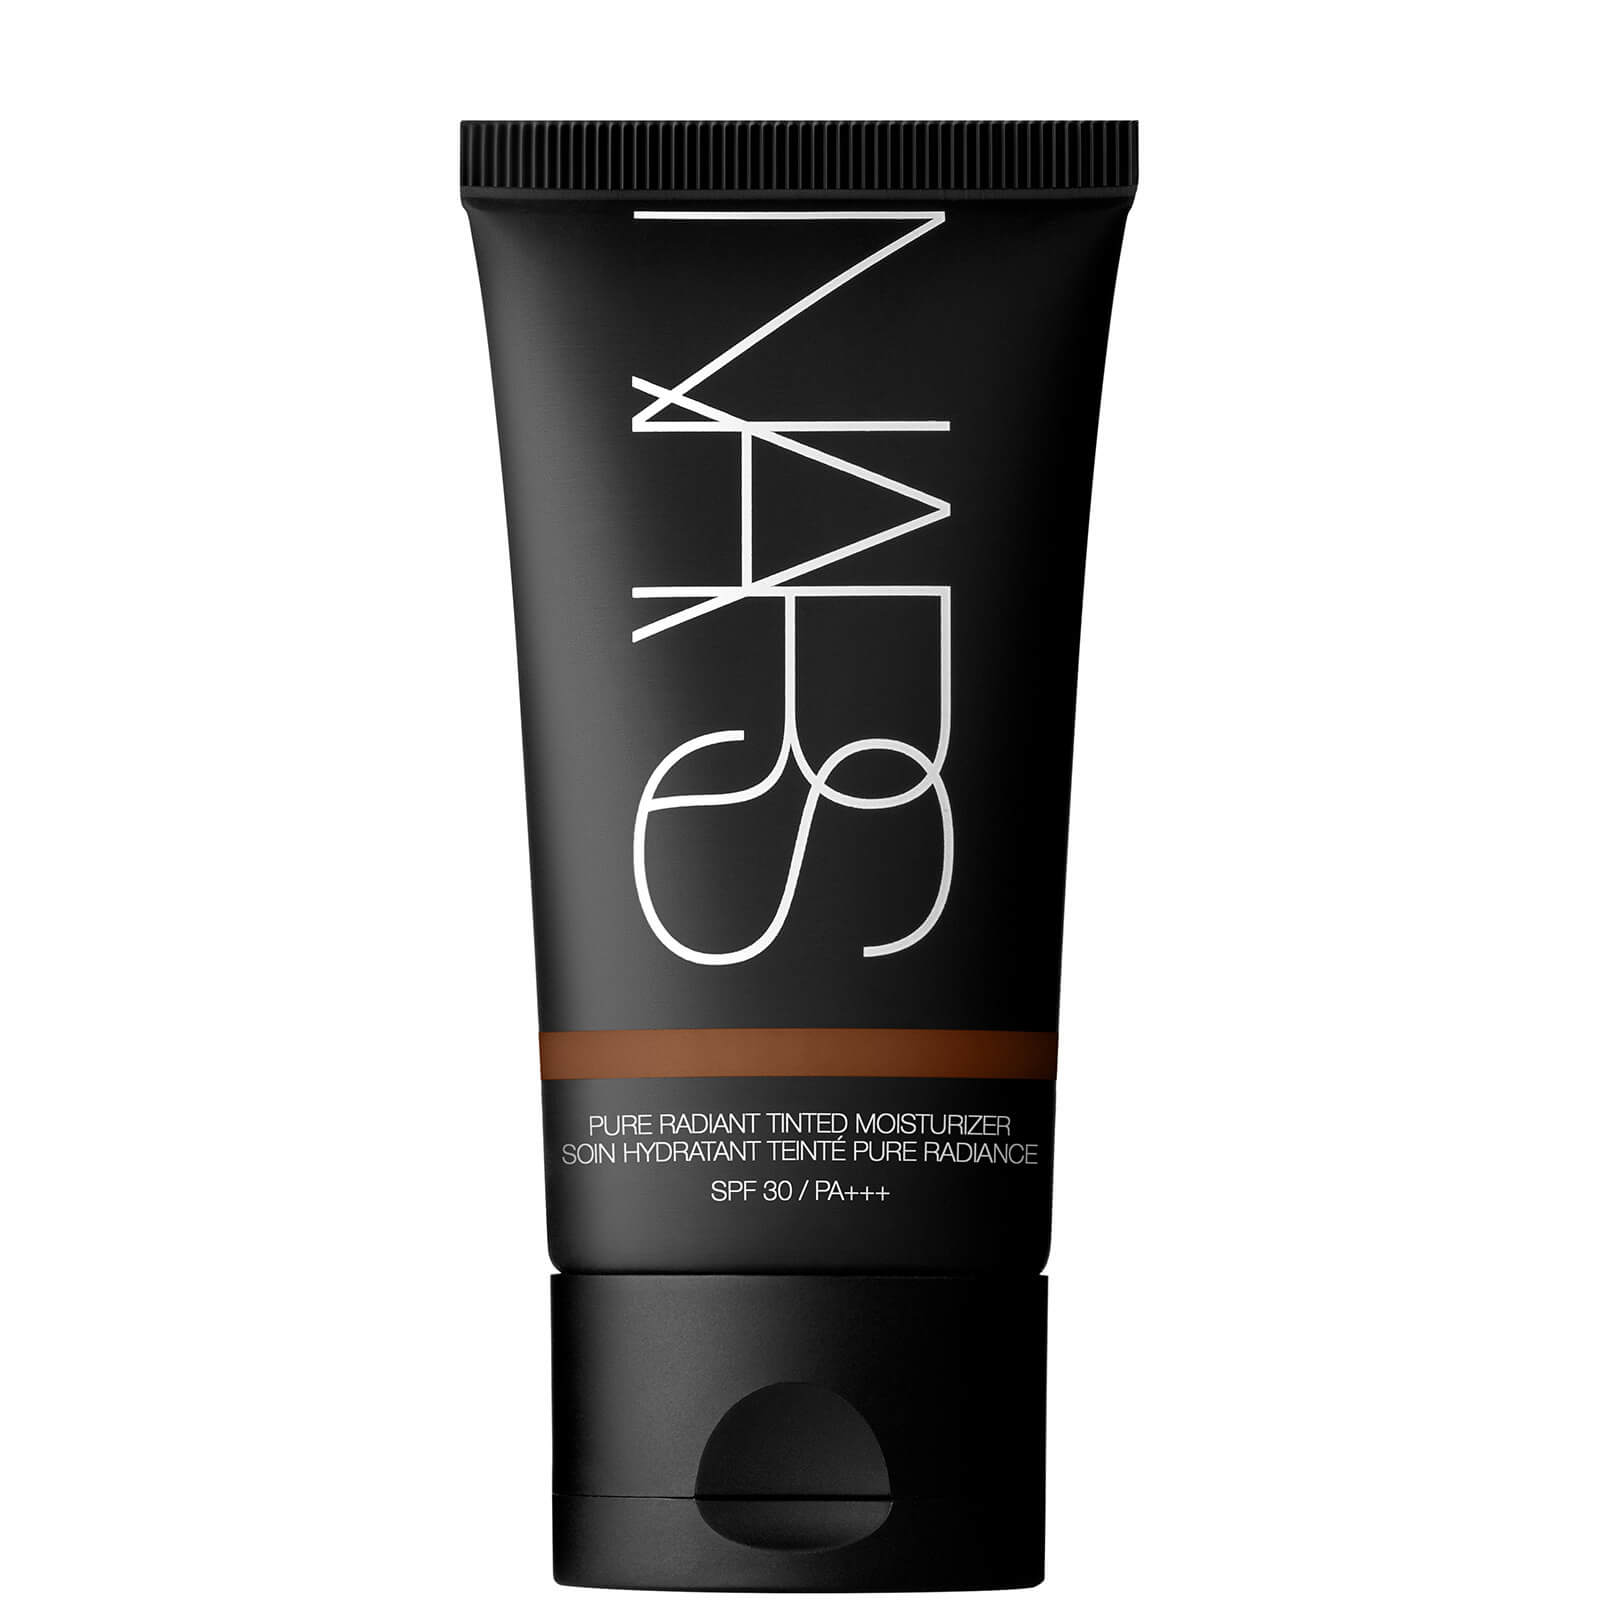 NARS Cosmetics Pure Radiant Tinted Moisturiser SPF30/PA+++ (Various Shades) - Guernsey